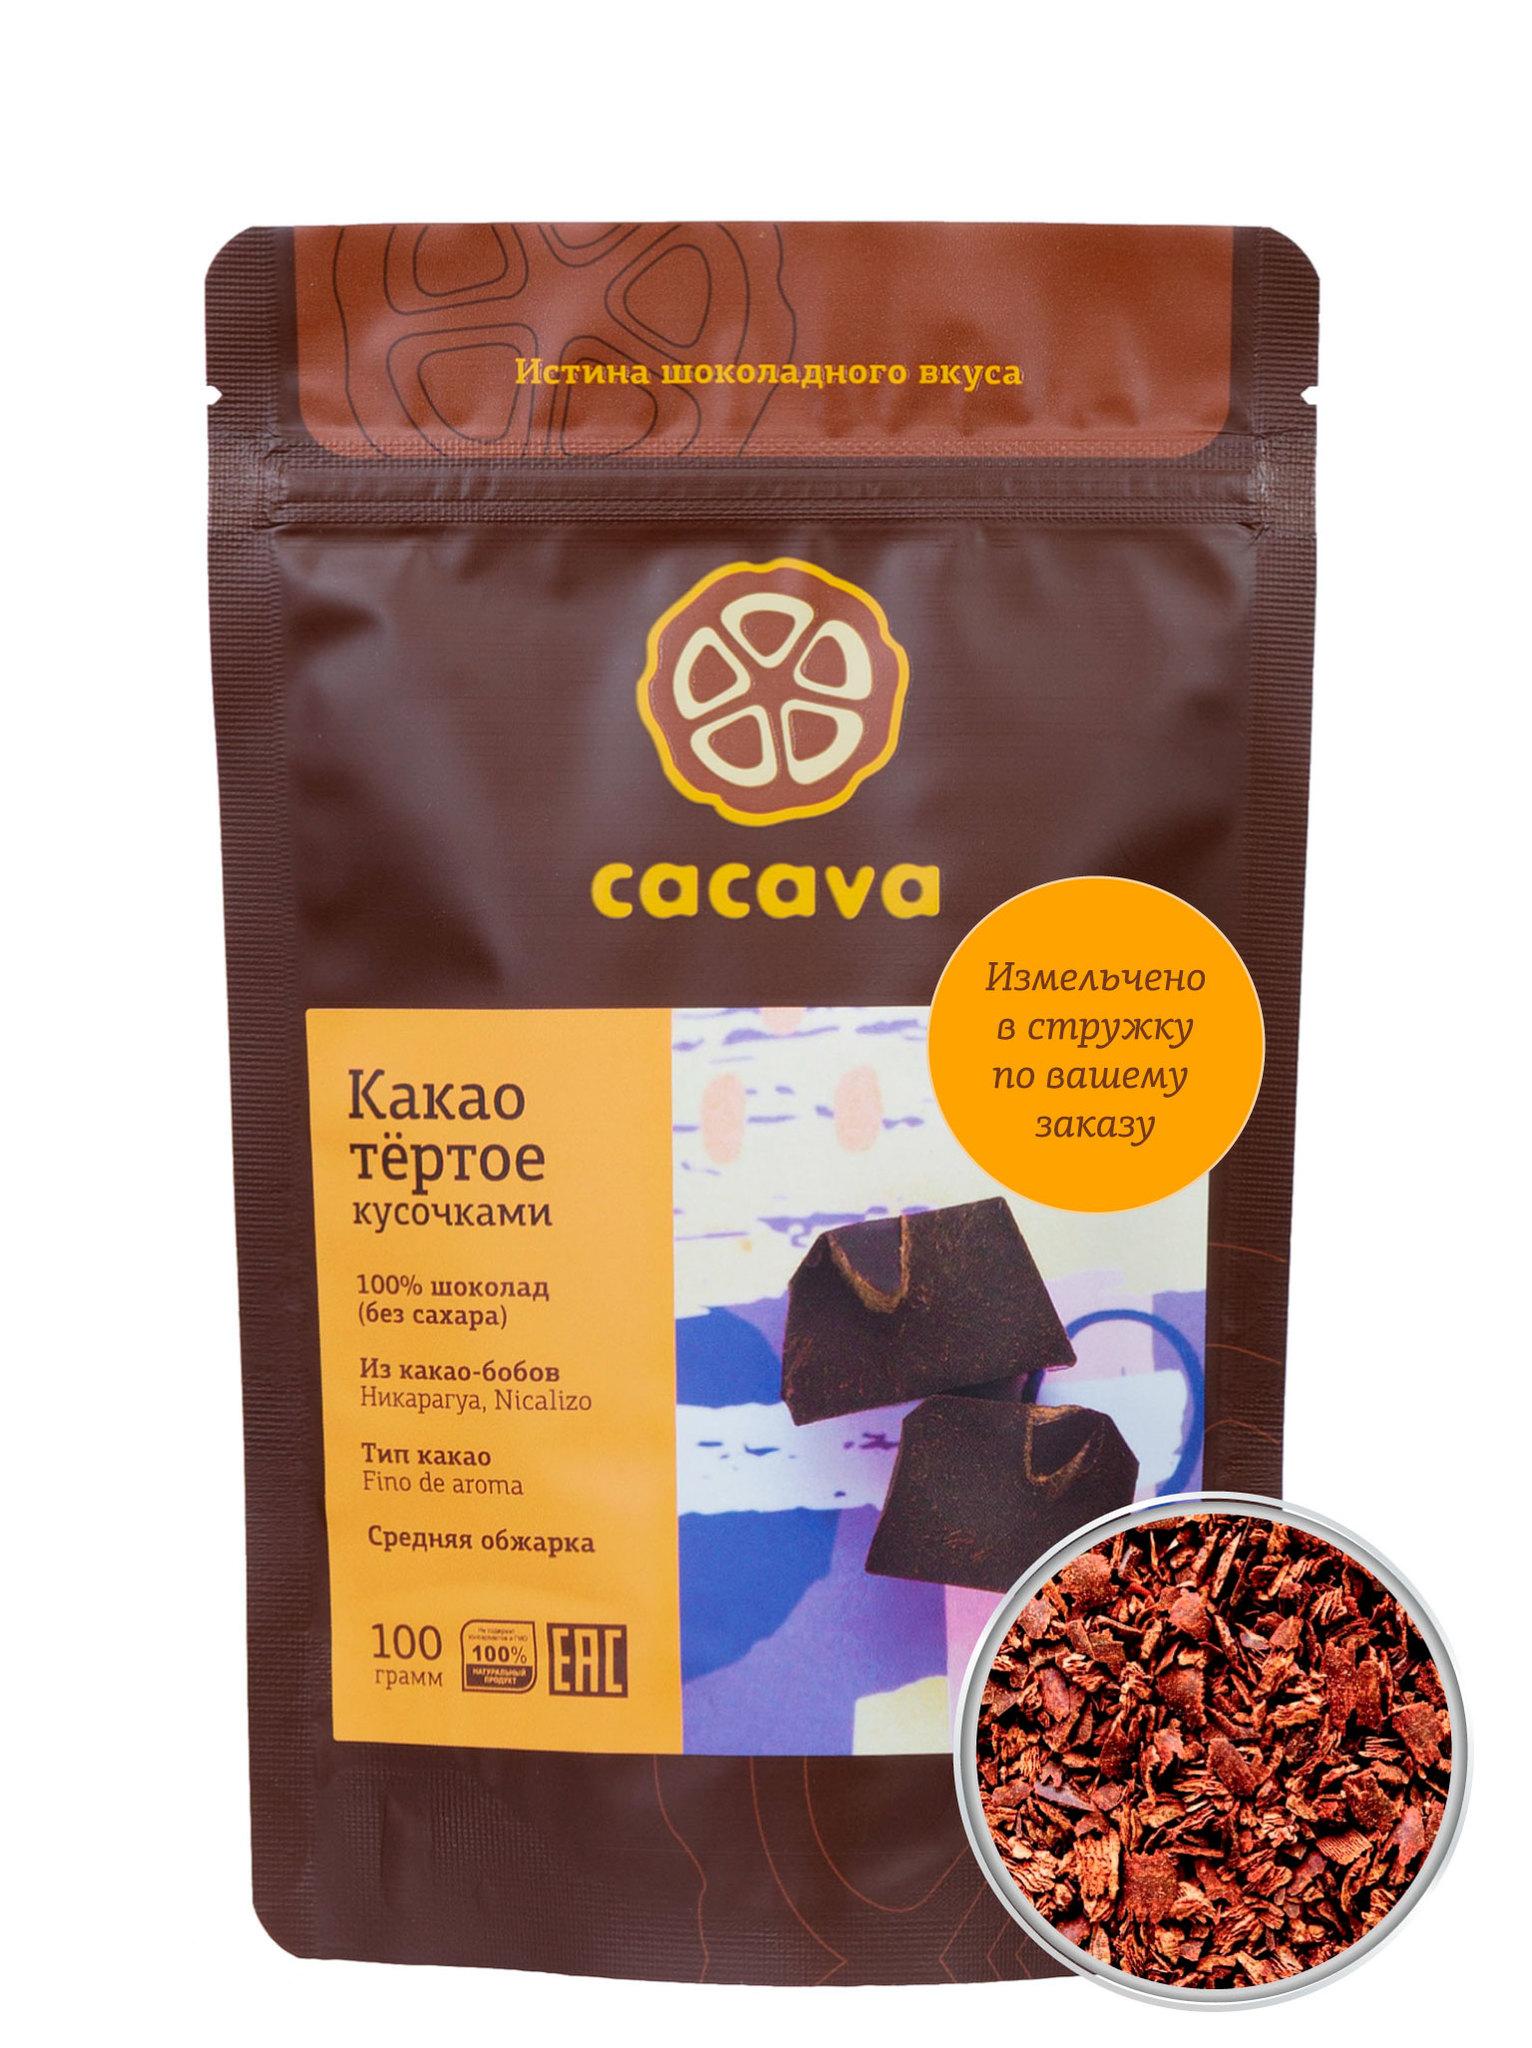 Какао тёртое в стружке (Никарагуа, Nicalizo), упаковка 100 грамм